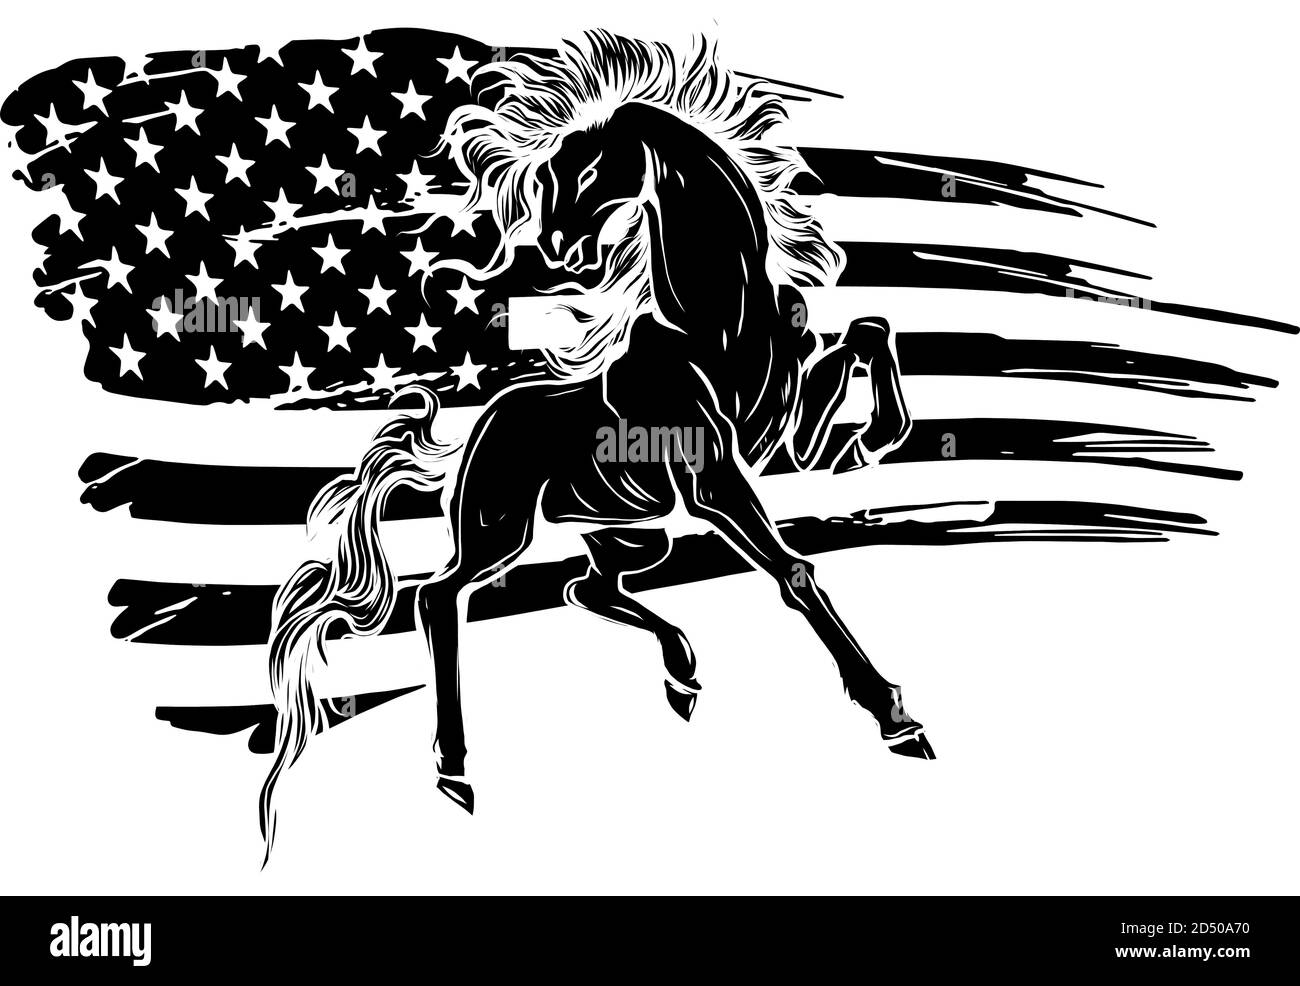 Grunge Flag Background Wild Horse Vector Illustration Black Silhouette Stock Vector Image Art Alamy